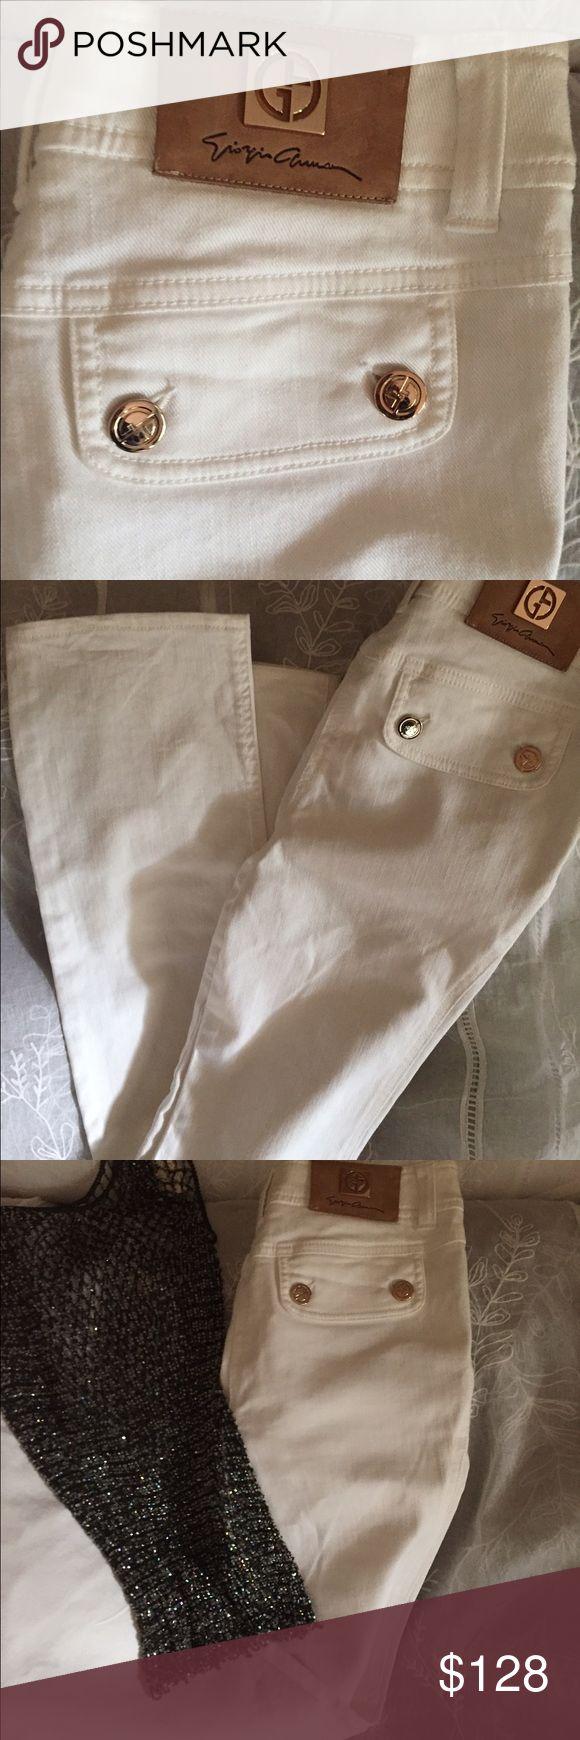 Giorgio Armani white jeans Giorgio Armani beautiful white jeans gold detail. Slit pockets Giorgio Armani Jeans Straight Leg